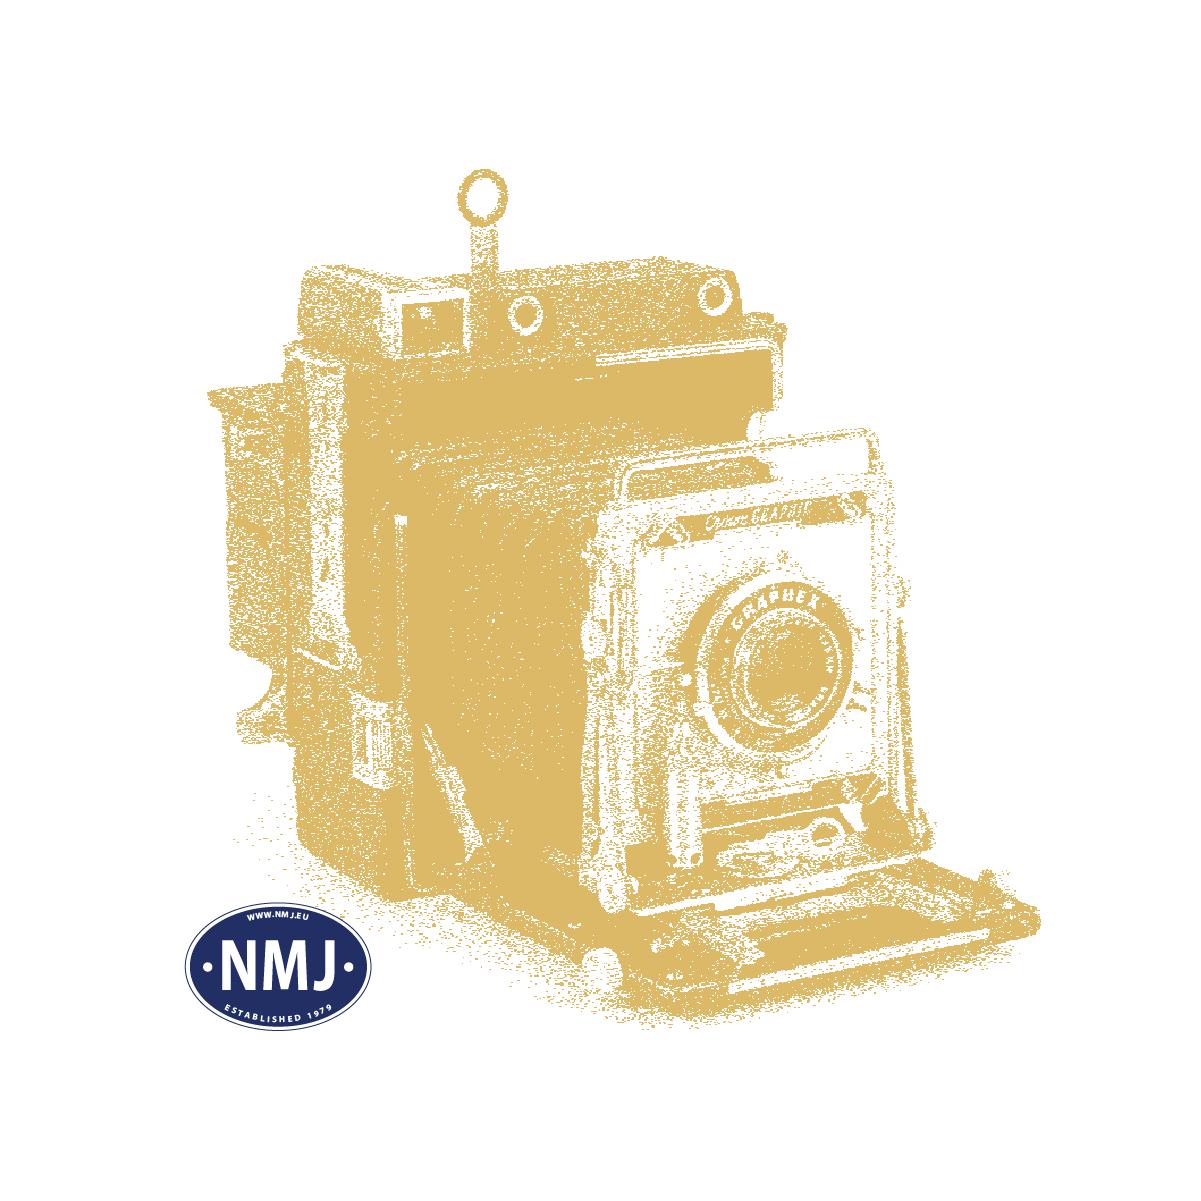 NMJT105.992 - NMJ Topline NSB B3 Radstromabnahmekontakte, 10 Stk